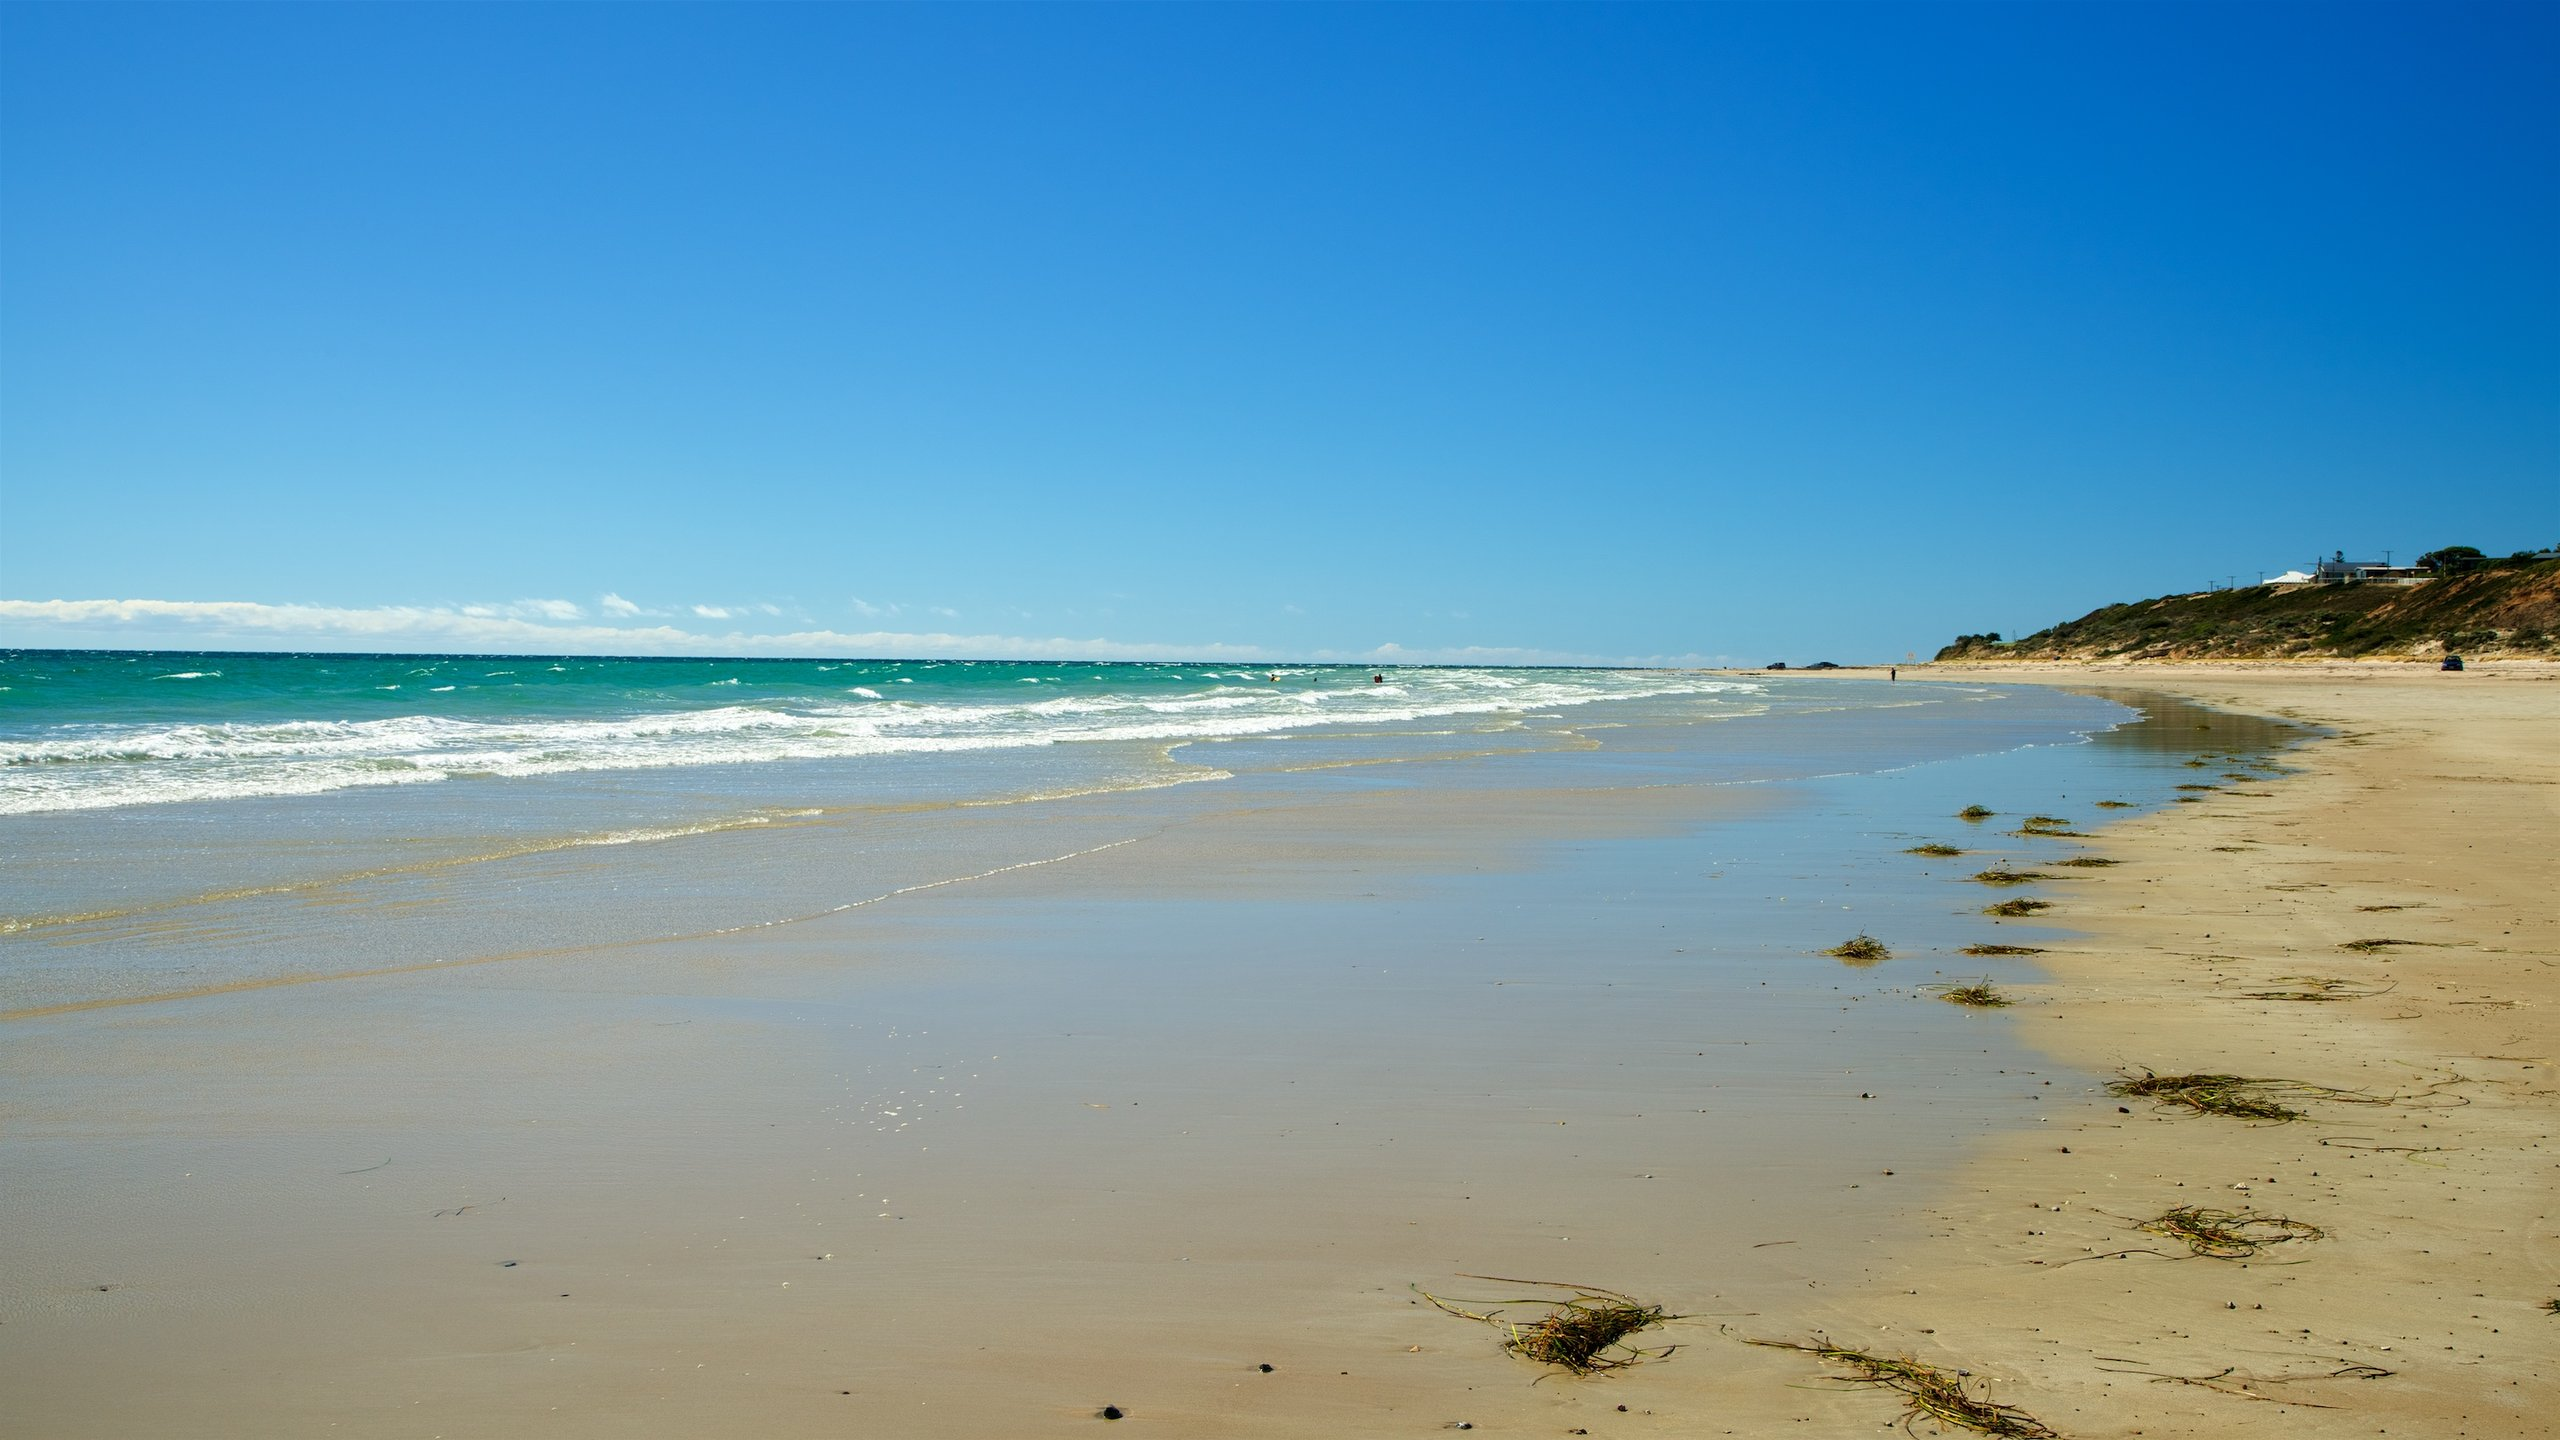 City Of Onkaparinga, South Australia, Australia